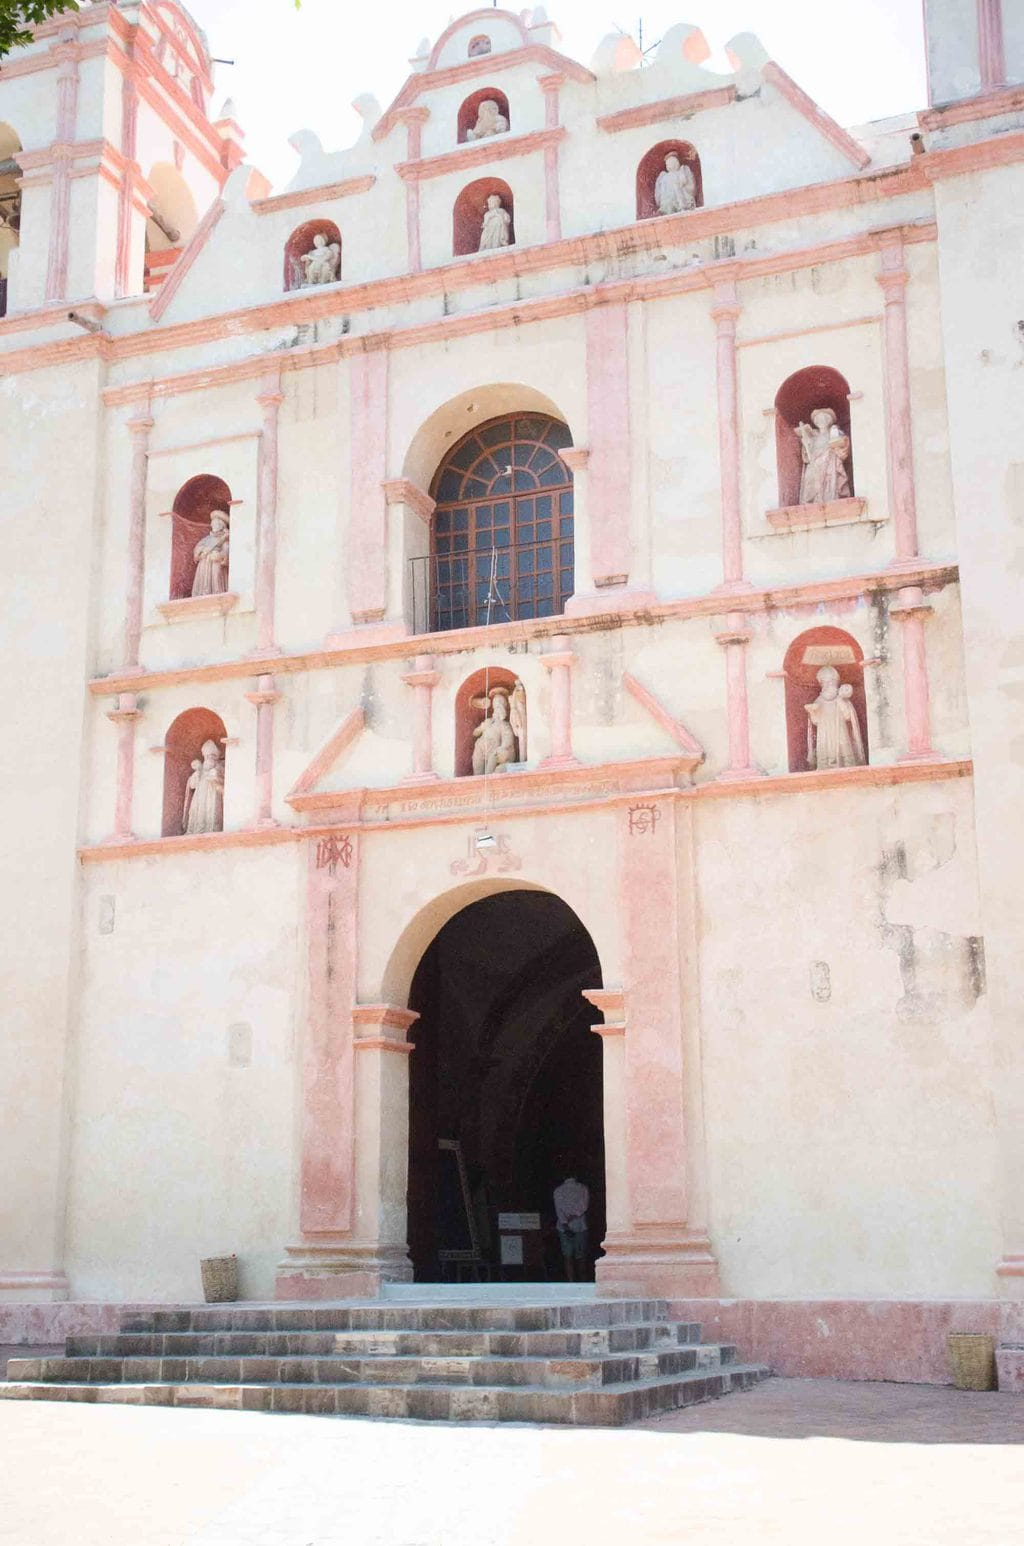 San Jeronimo Church in Tlacochahuaya, Oaxaca